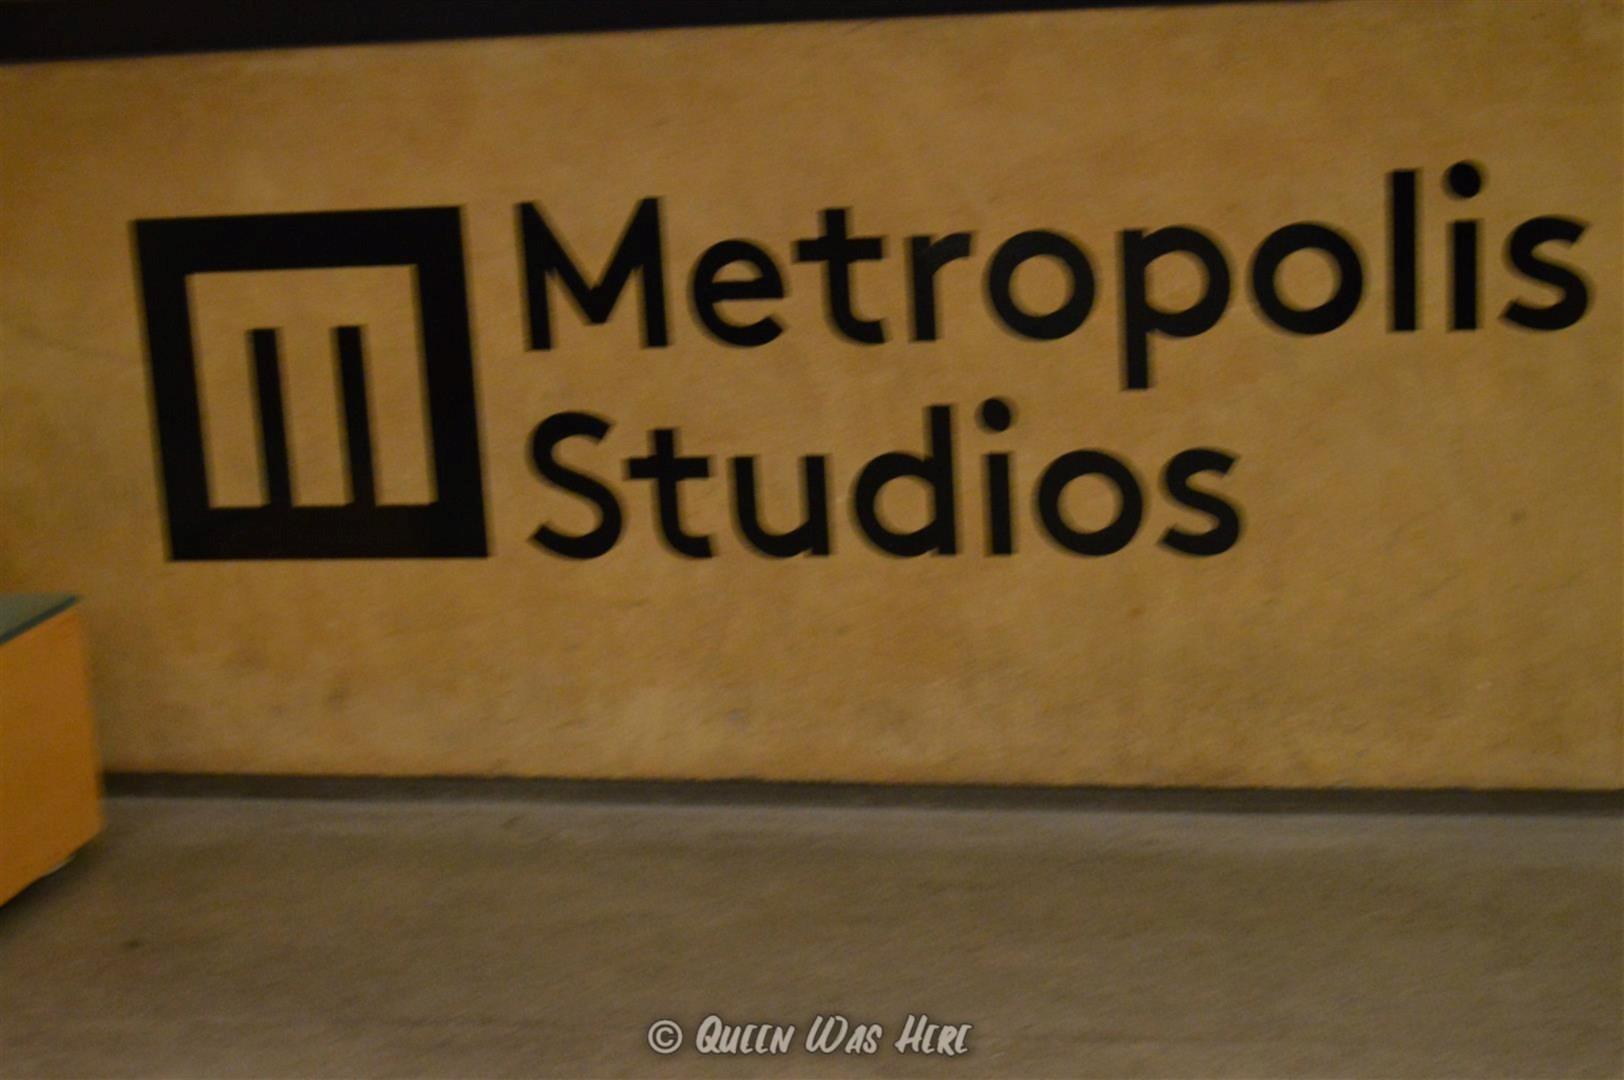 Queen-metropolis-studios-london-headlong-innuendo-7